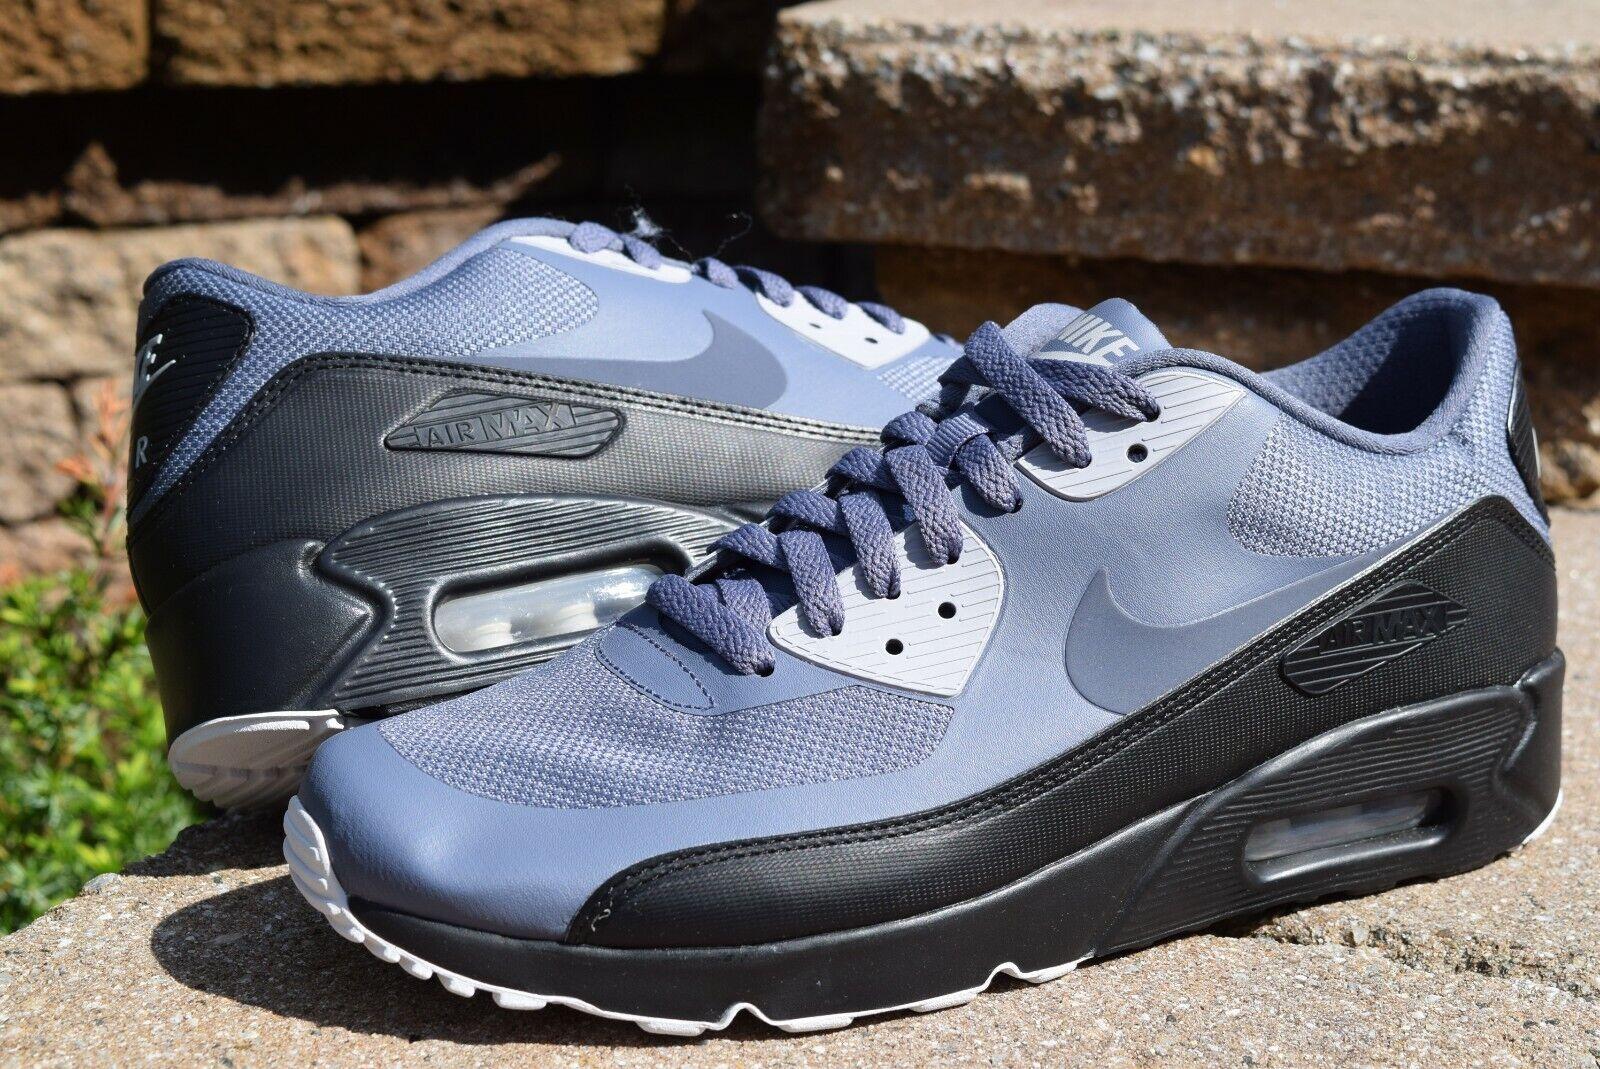 asistencia deseable explosión  Unreleased Nike Air Max 90 Ultra 2.0 Essential Sample Sz 9 Mushroom  875695-200 for sale online | eBay